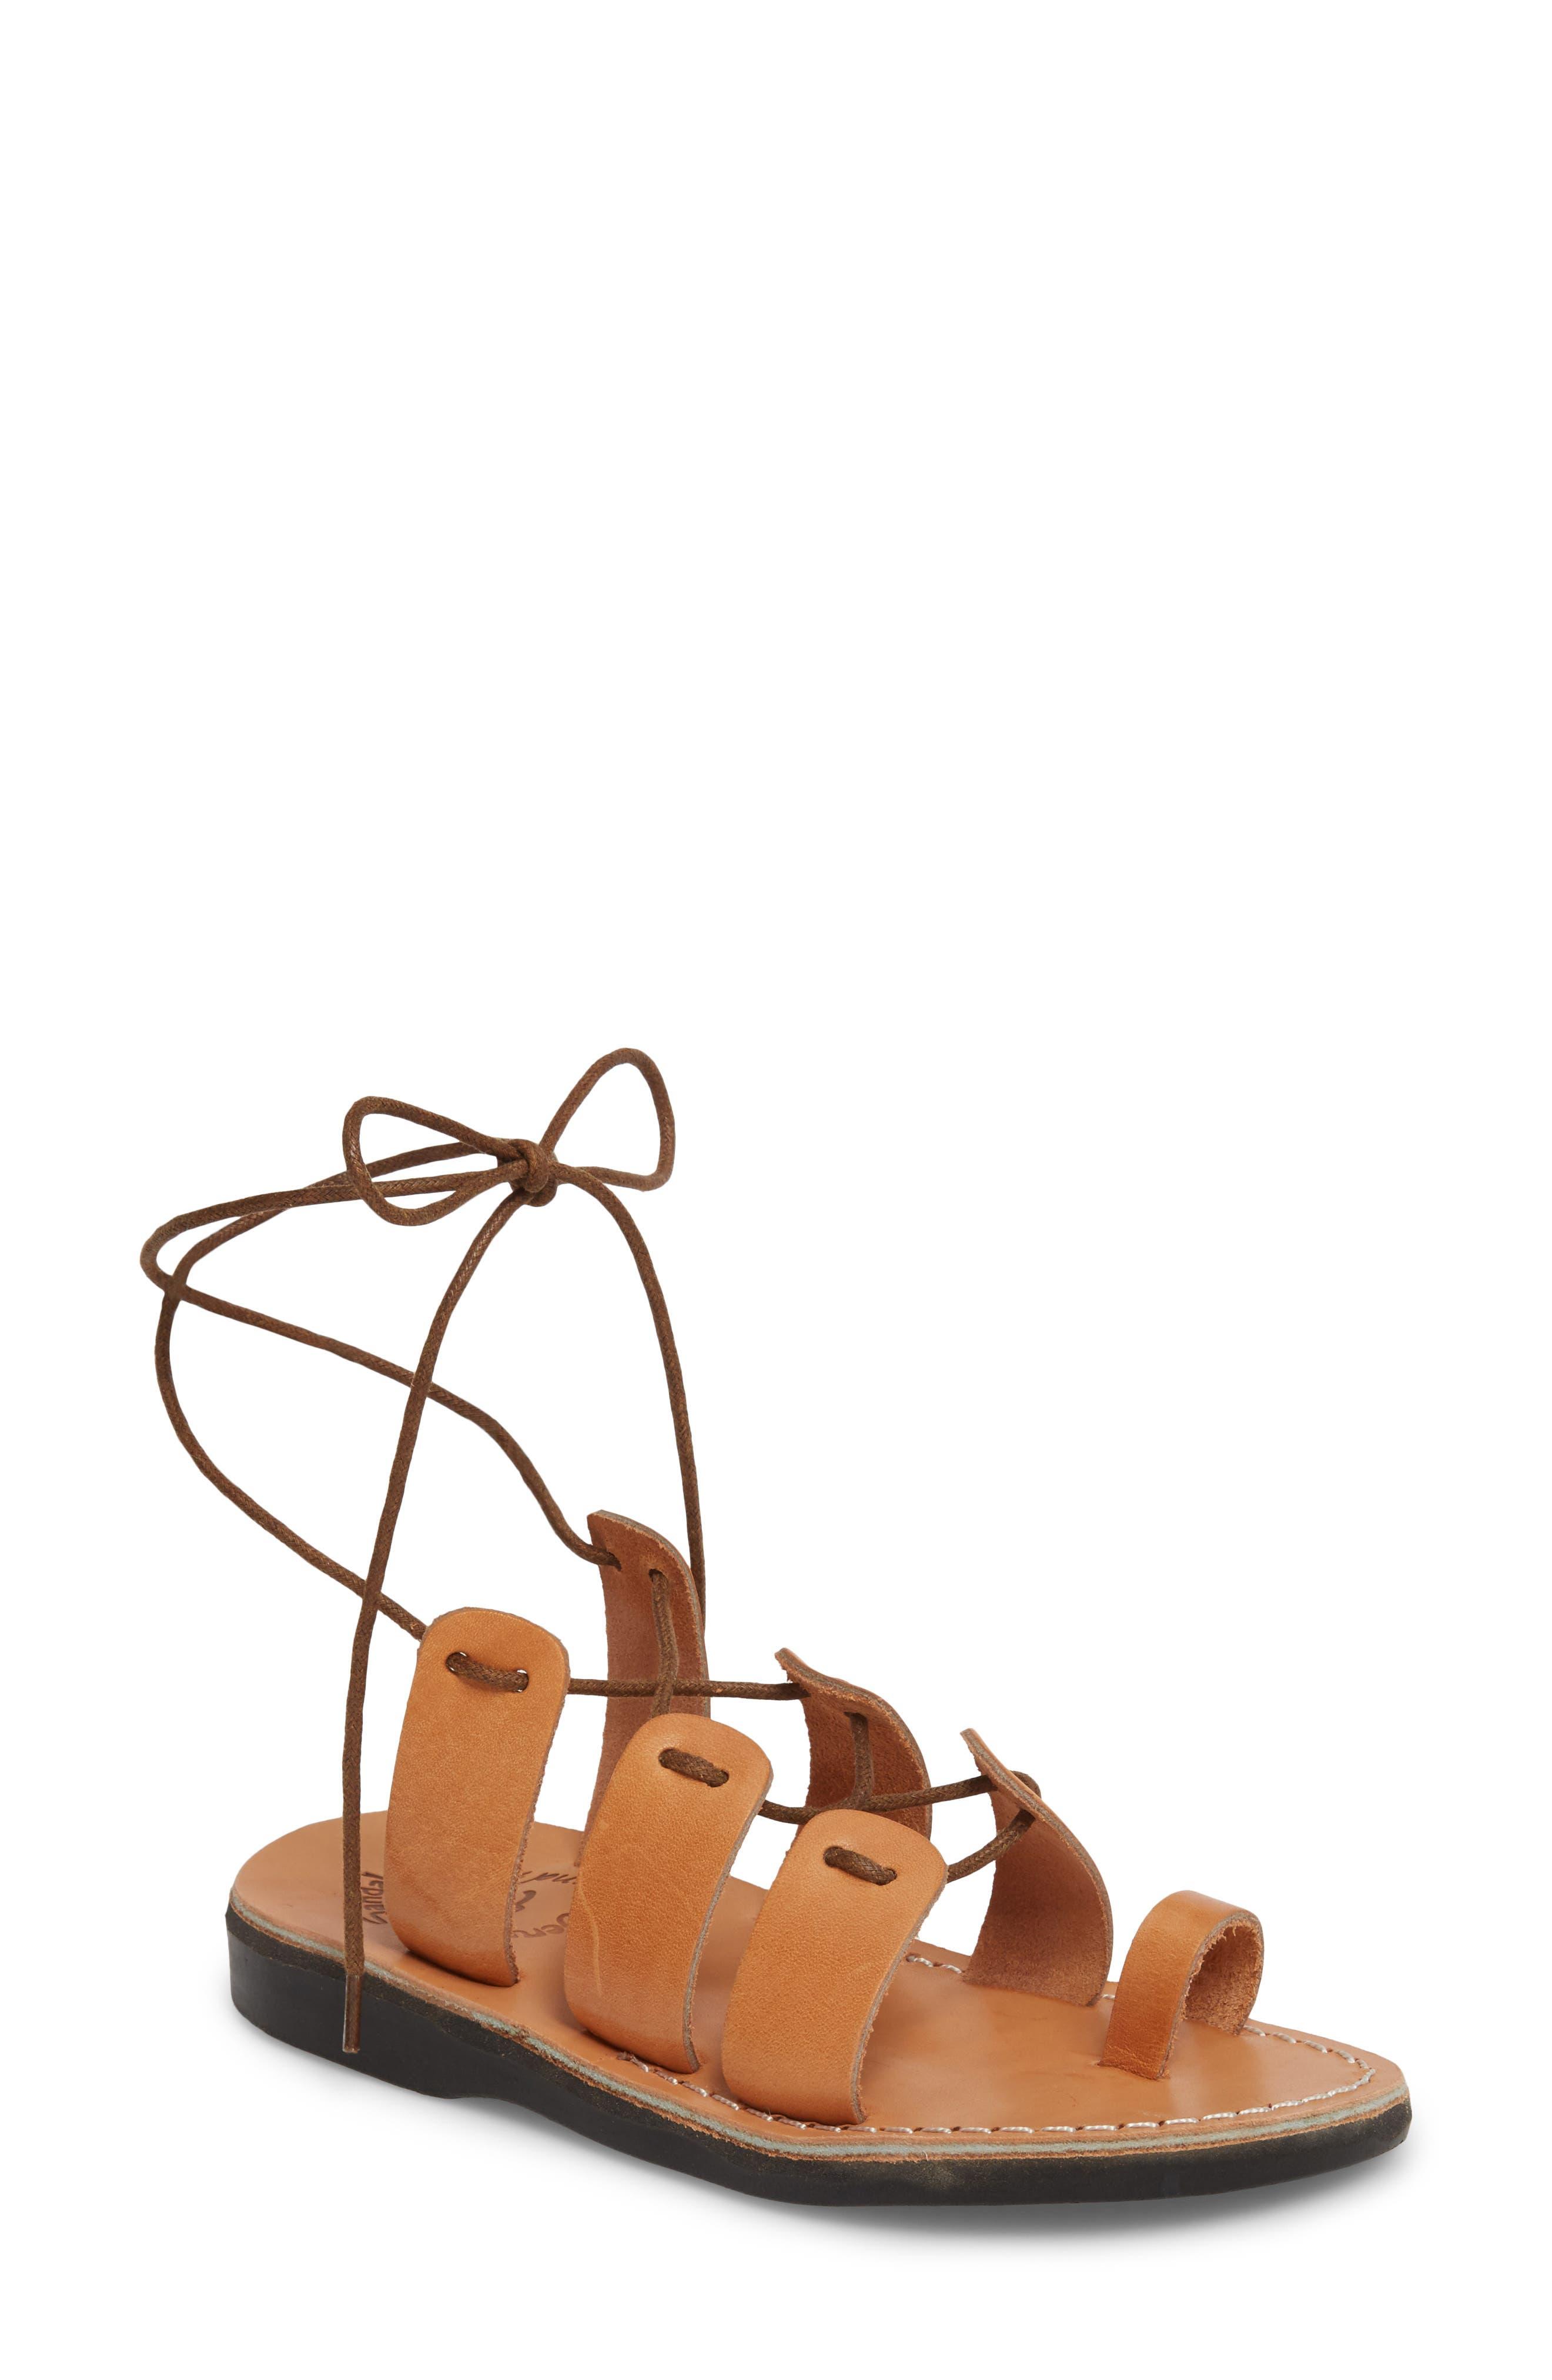 Alternate Image 1 Selected - Jerusalem Sandals Deborah Wraparound Laces Sandal (Women)